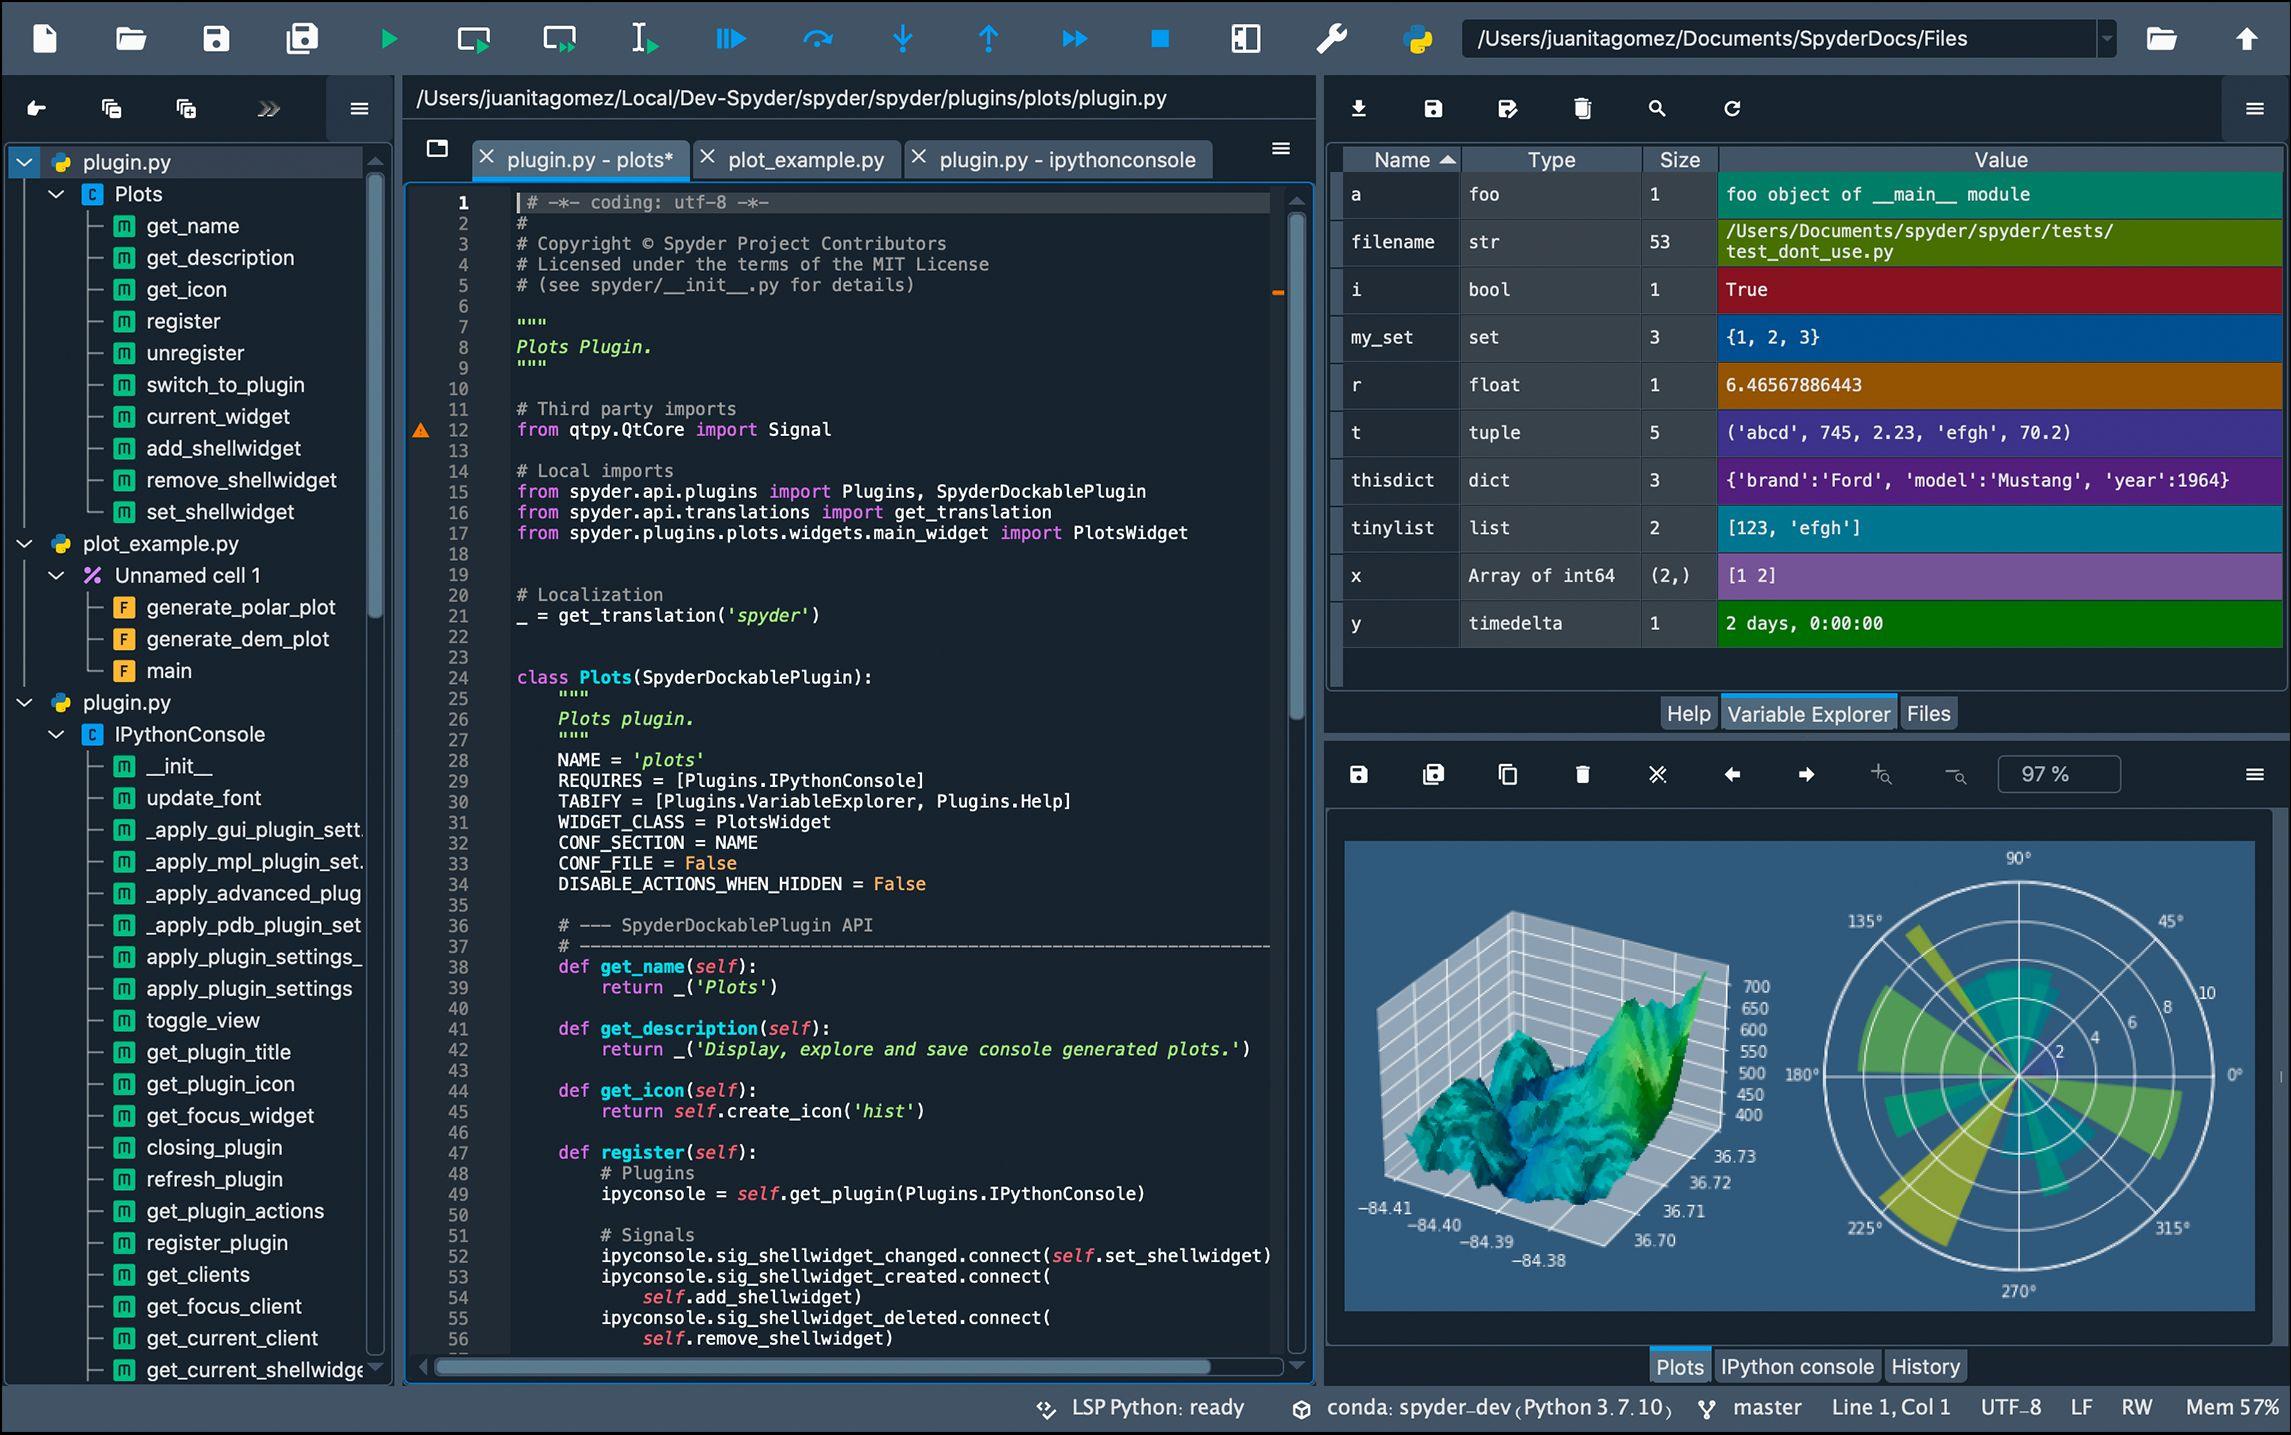 spyder_main_window_screenshot